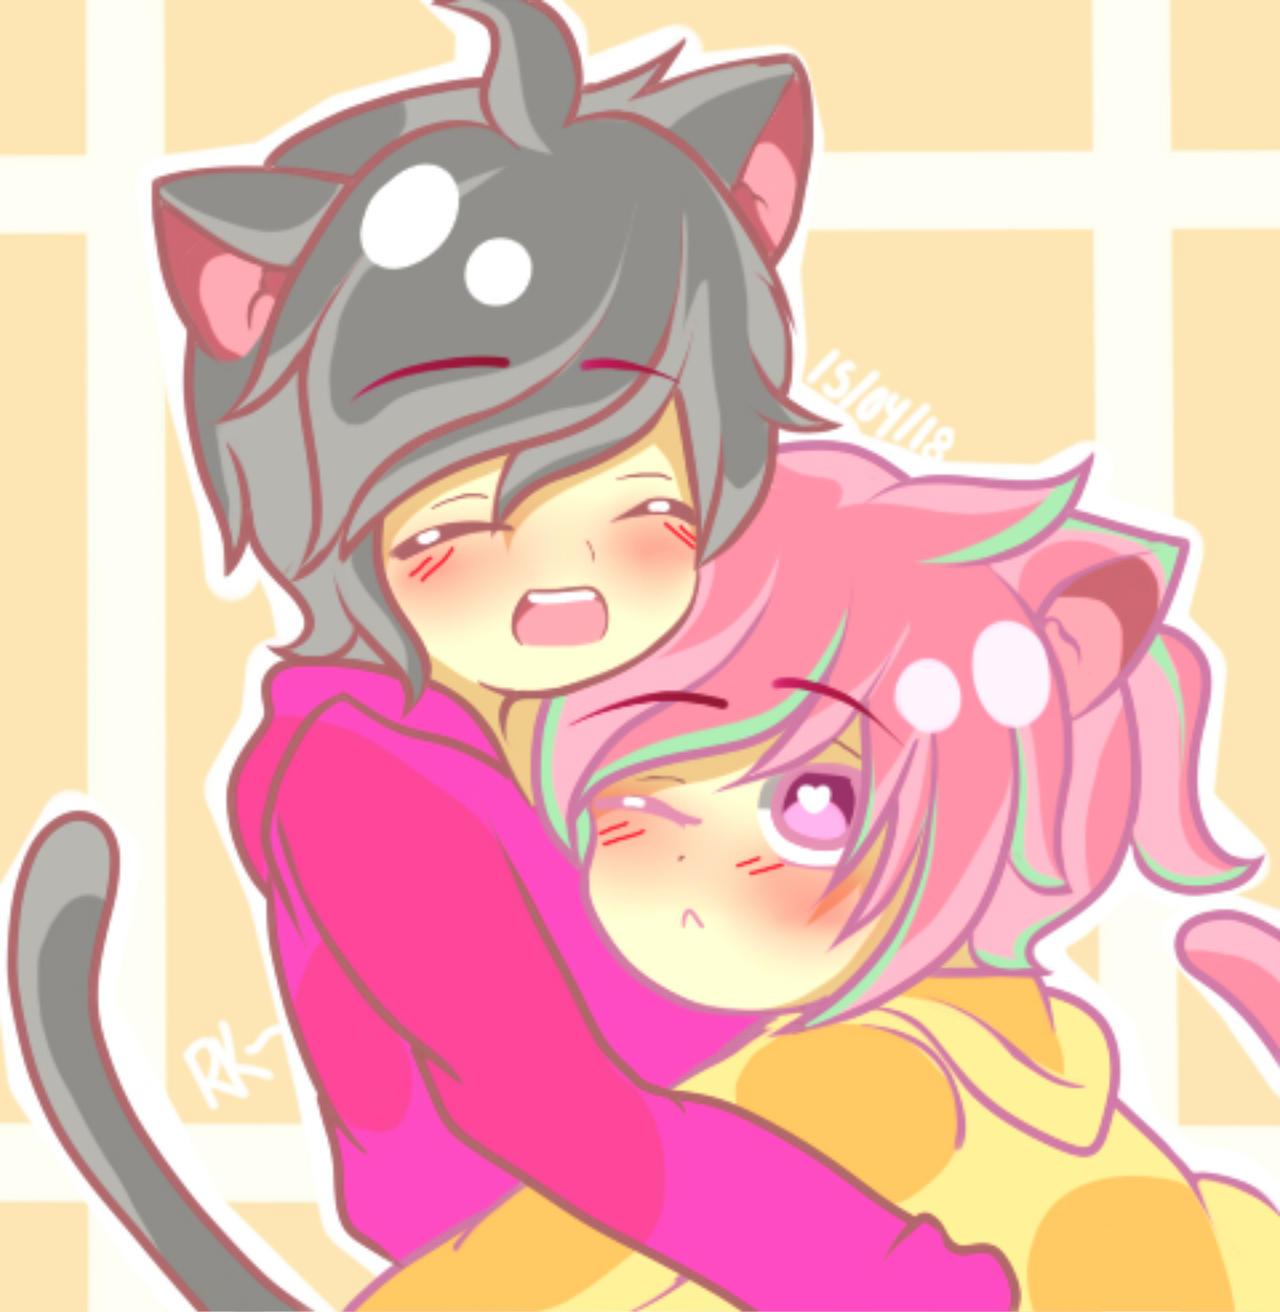 Kittens -oc- by RyuujiKarami